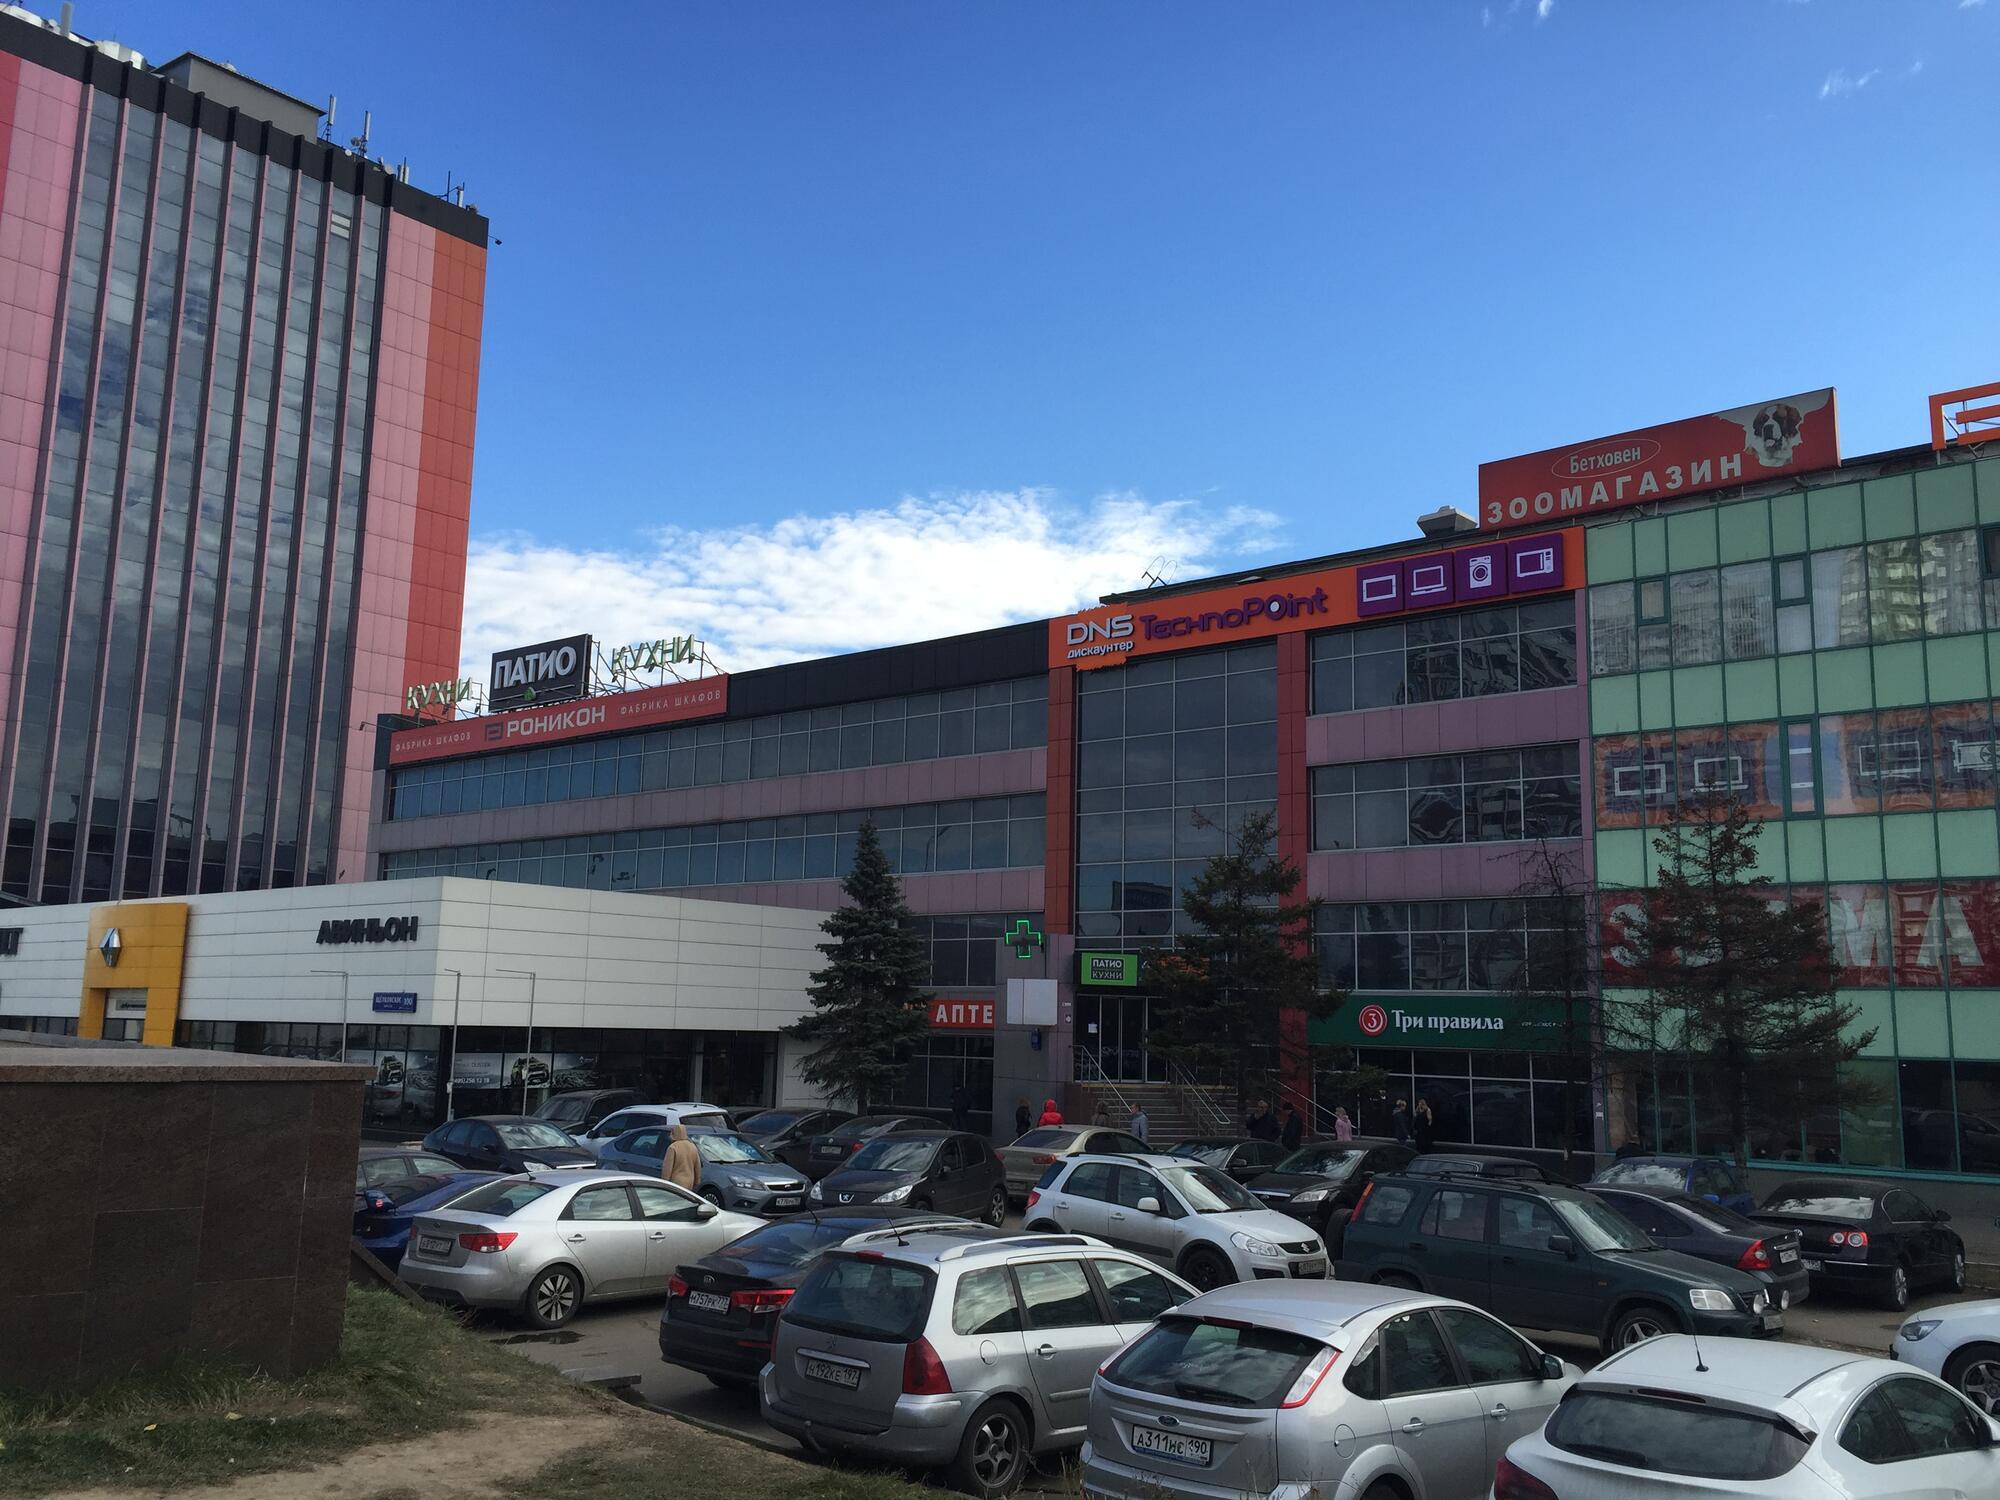 eef49a881e1a Москва – магазин DNS Москва, Магазин-склад ТЦ Щелково   адрес ...